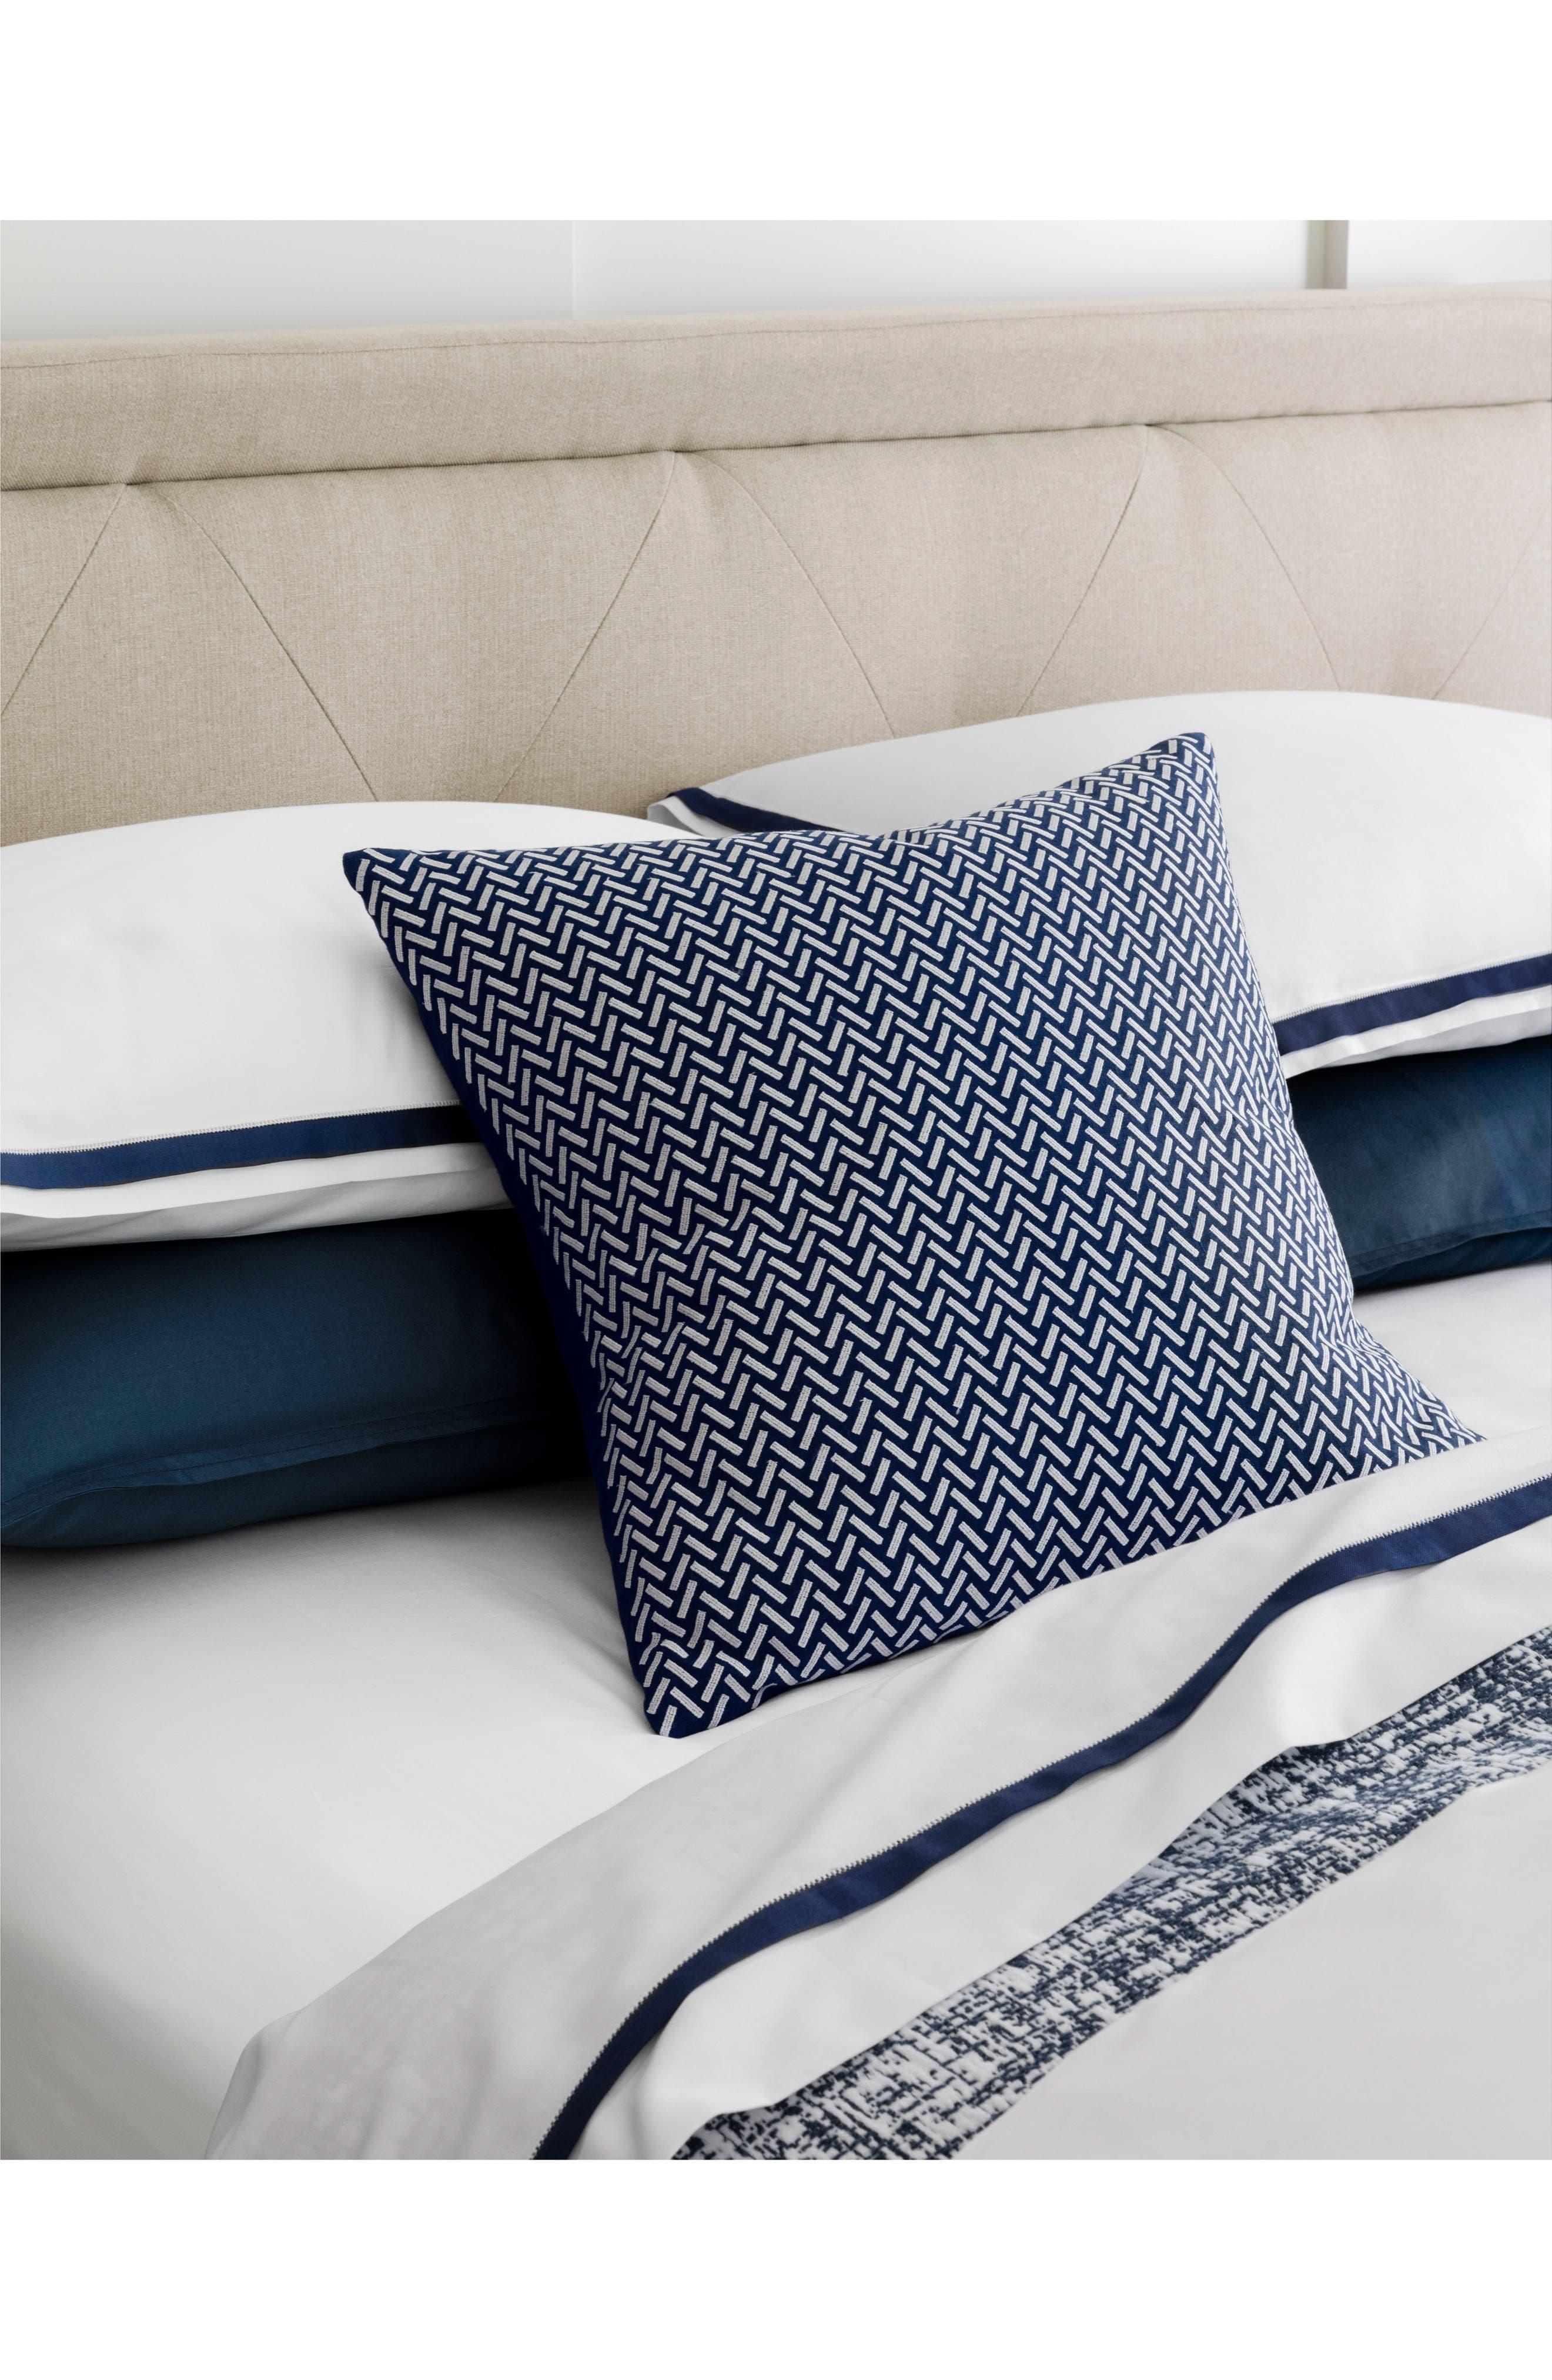 Corana Linen Pillow,                             Alternate thumbnail 4, color,                             NAVY/WHITE